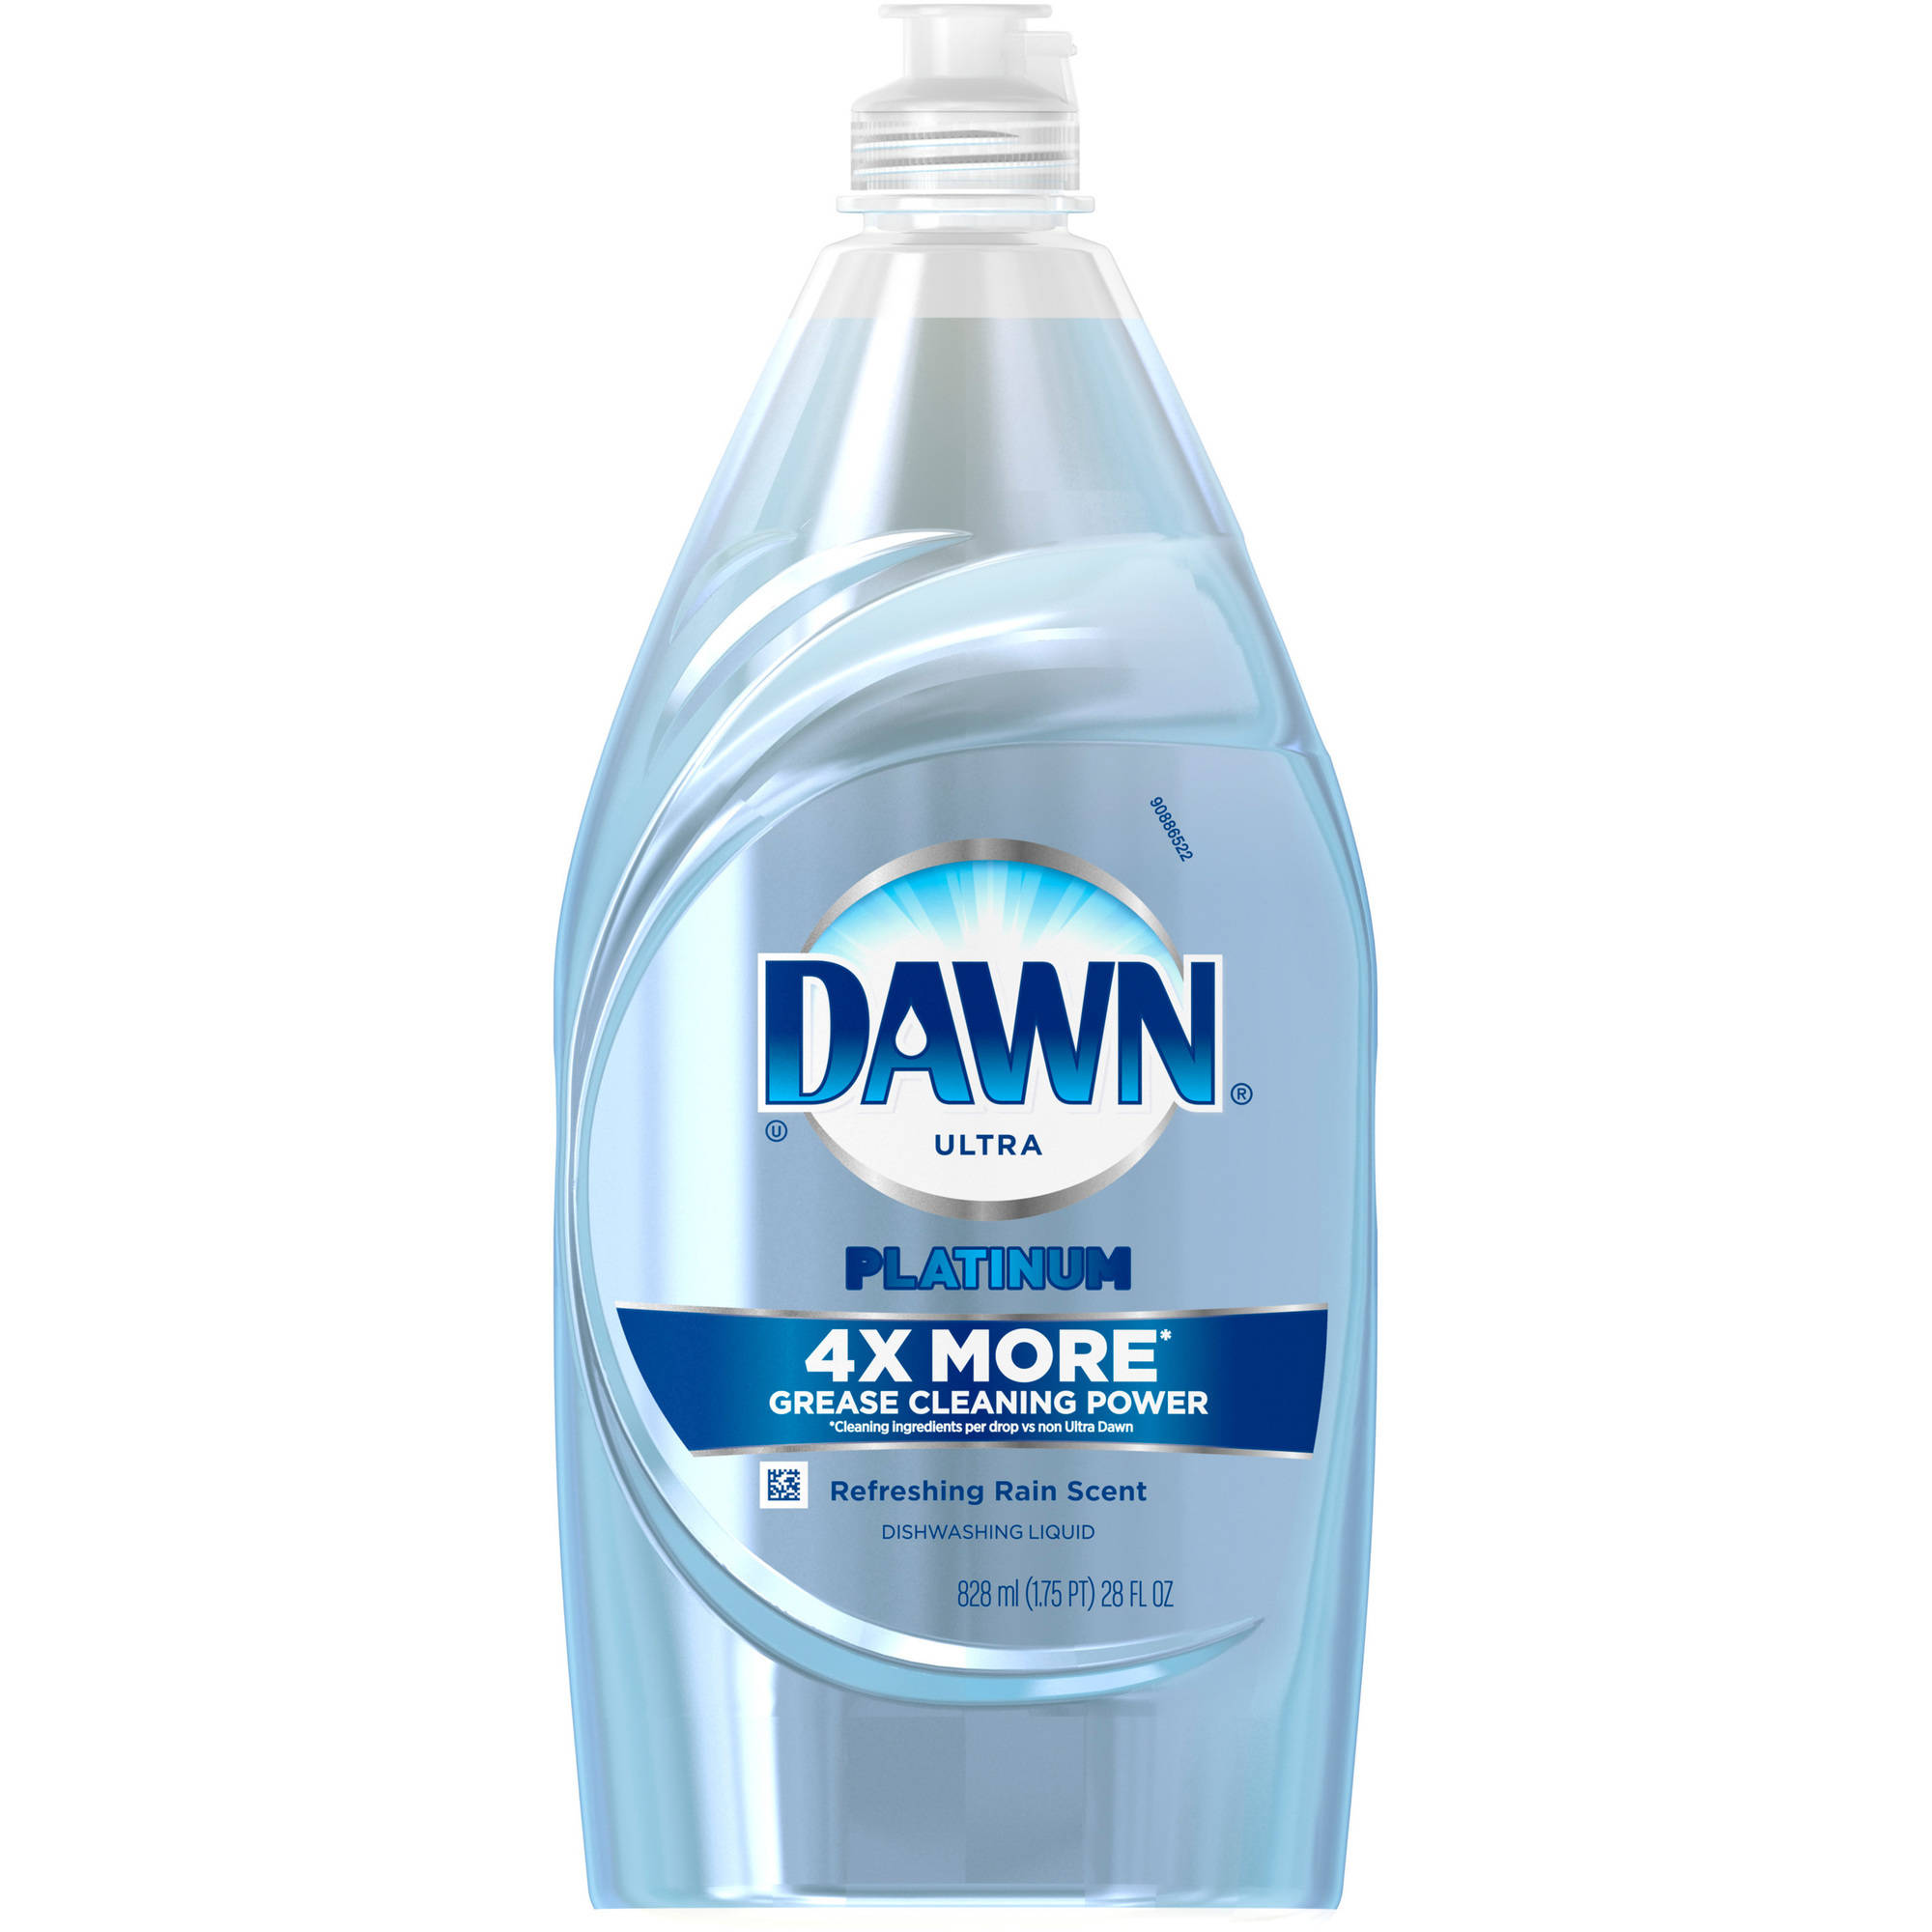 Dawn Platinum Power Clean Dishwashing Liquid Refreshing Rain (choose your size)